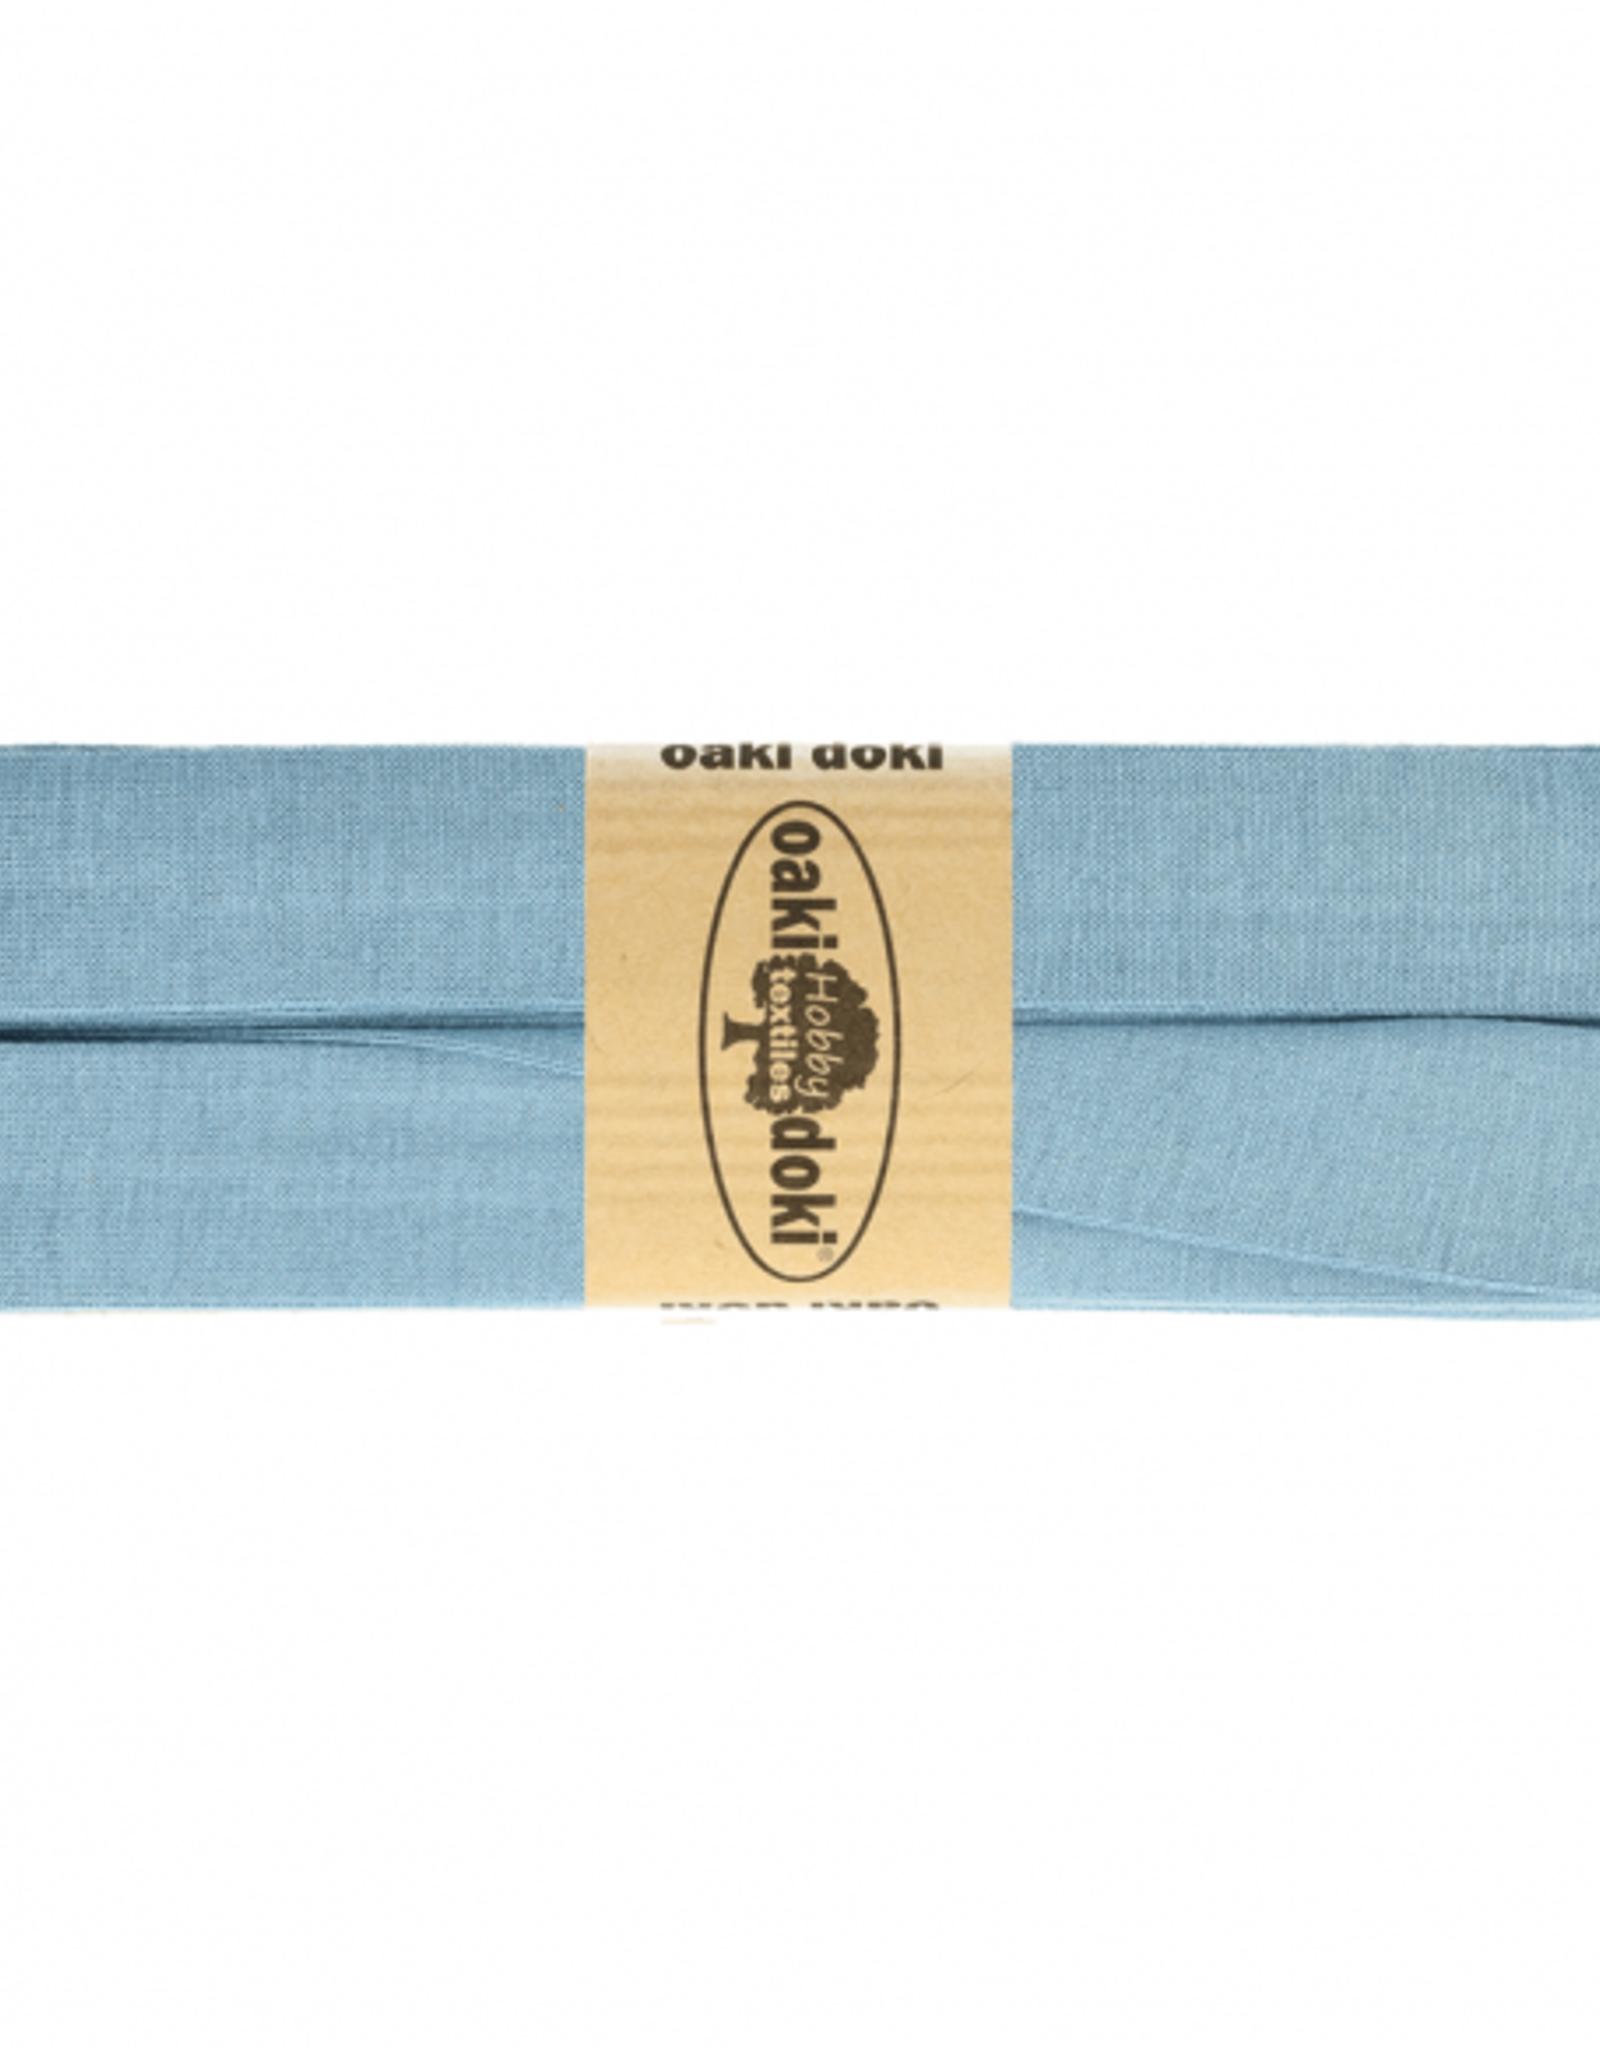 Oaki Doki Tricot de luxe jersey biaisband 20mm x 3m 003